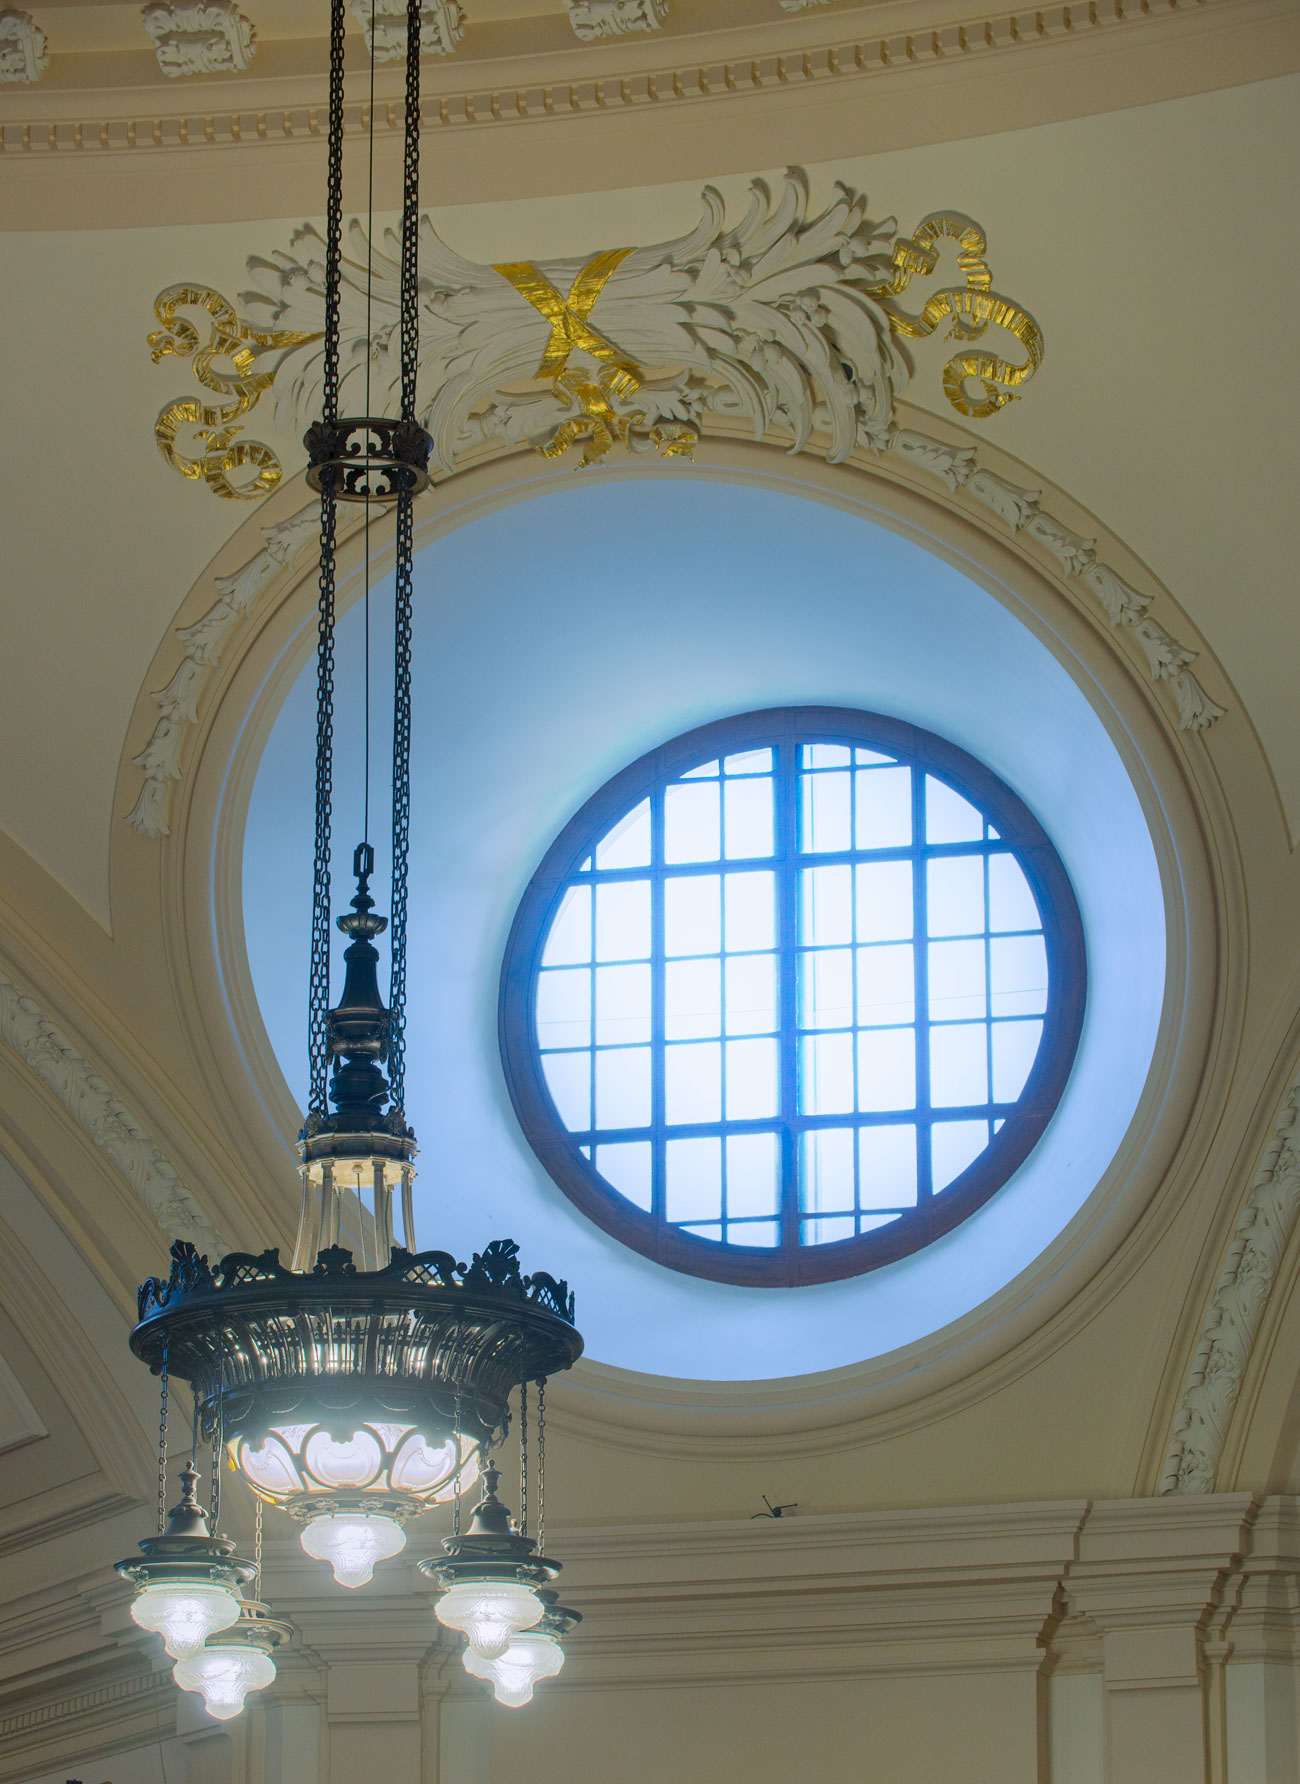 ablett-architects-Central-Hall1